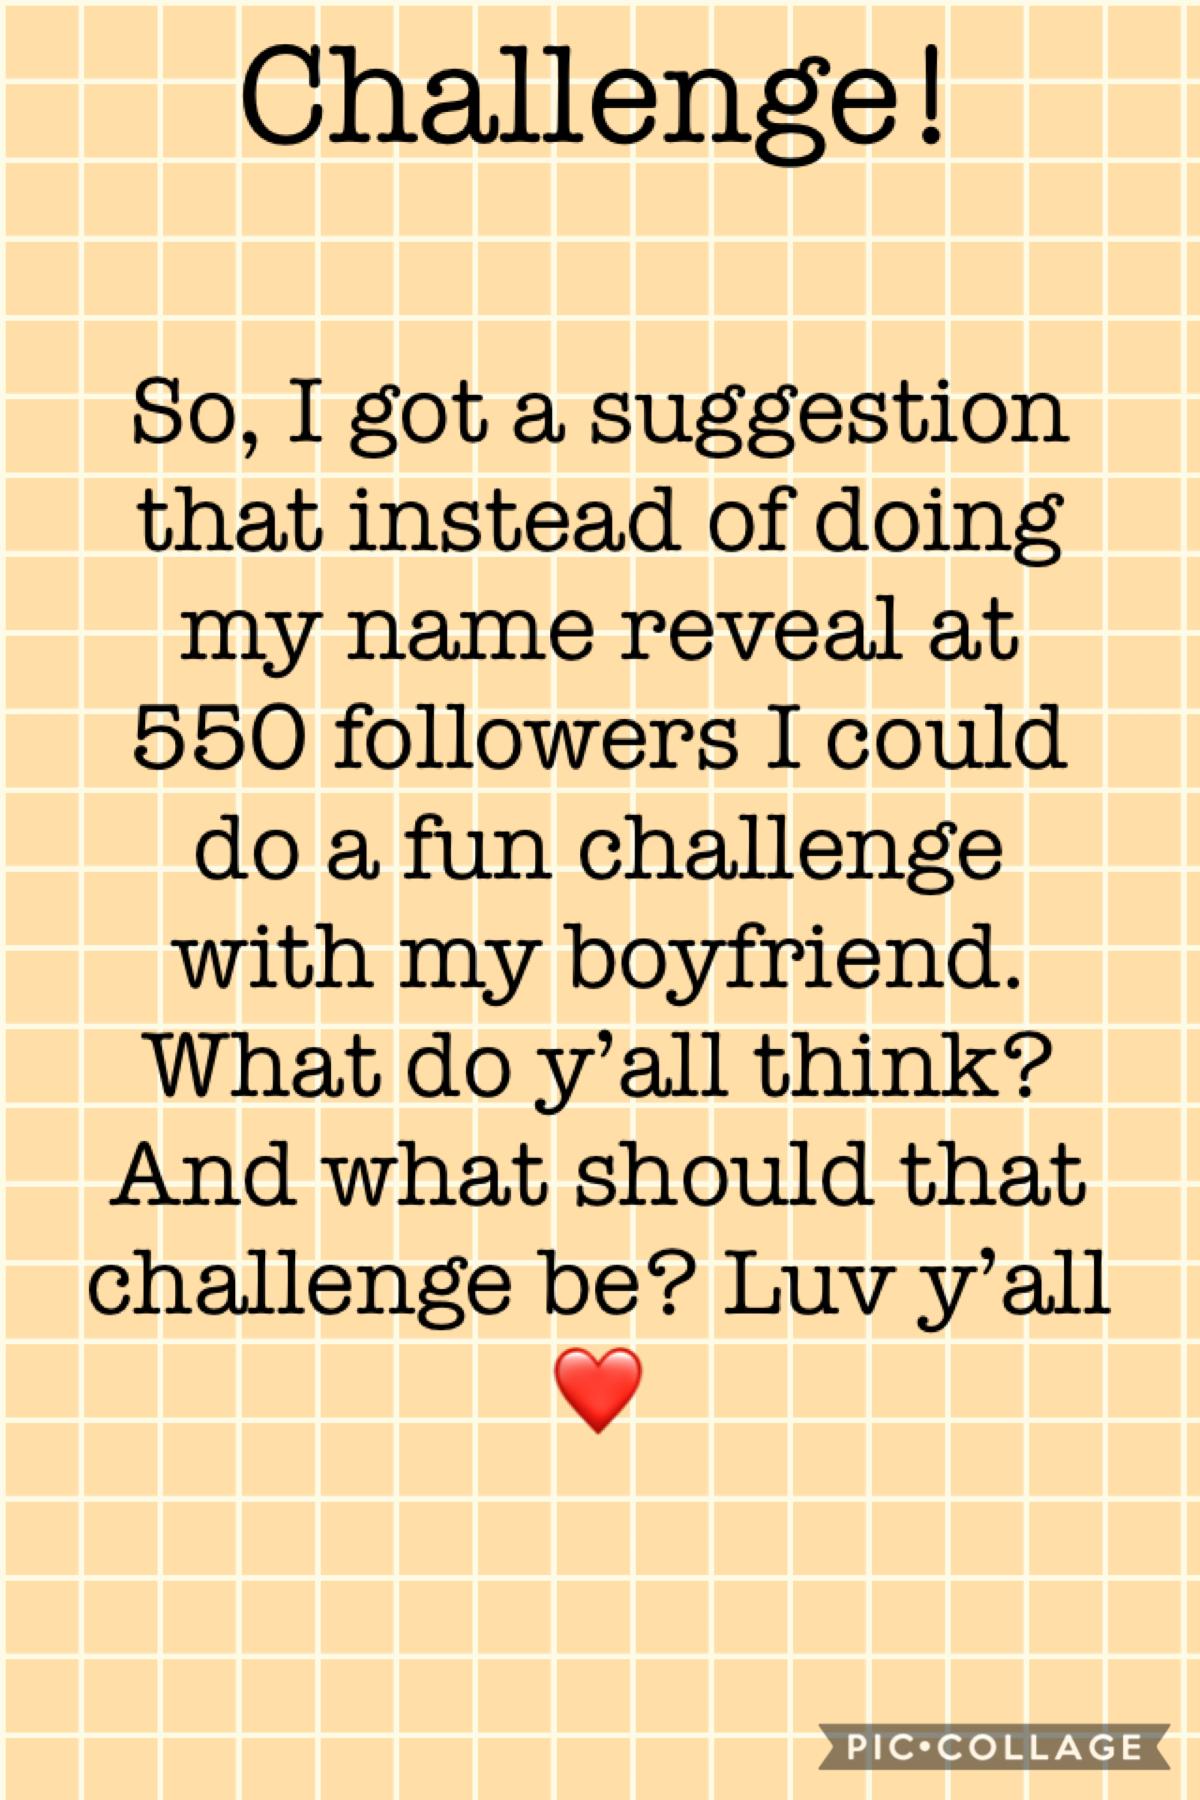 Challenge!